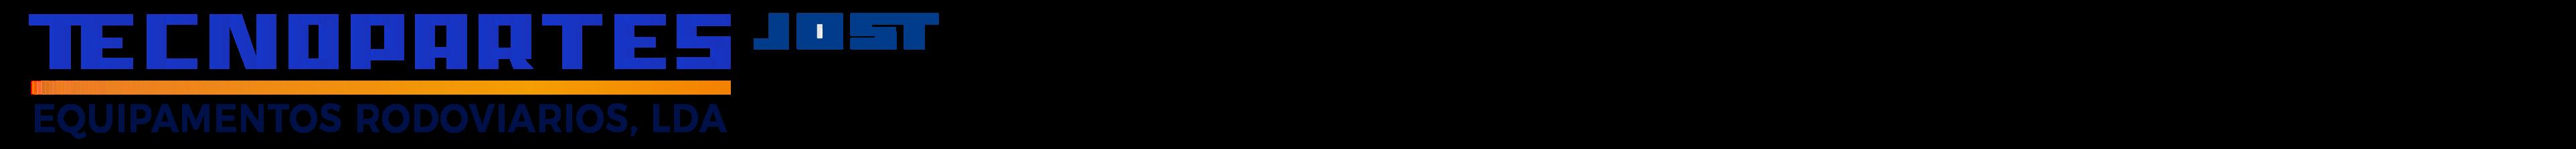 Tecnopartes Logo